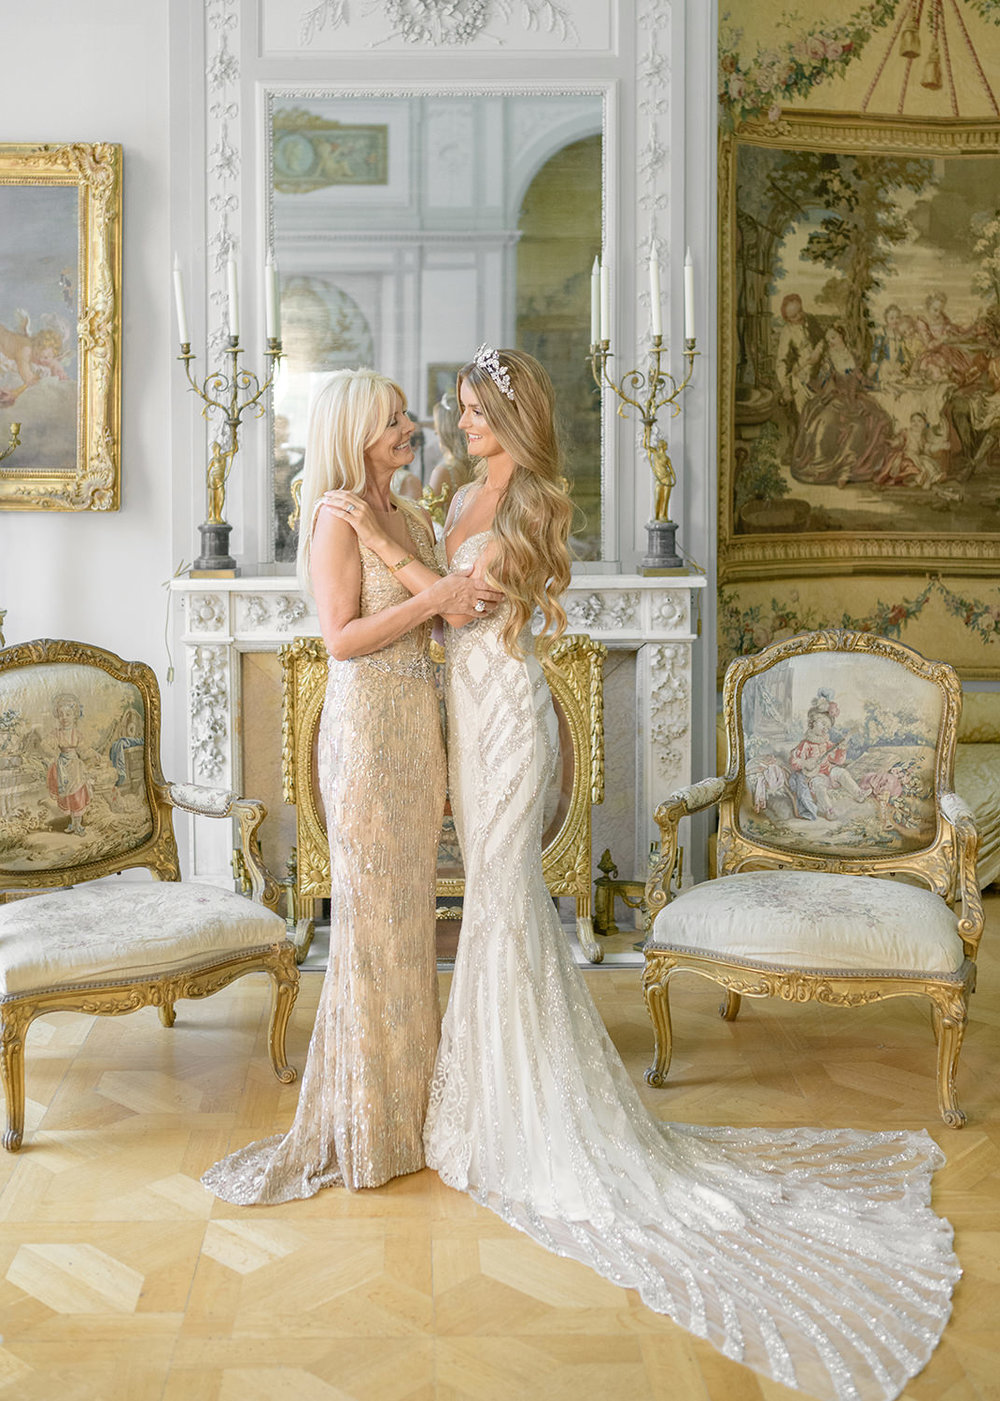 french riviera wedding photographer-F&D-©bottega53-98.JPG